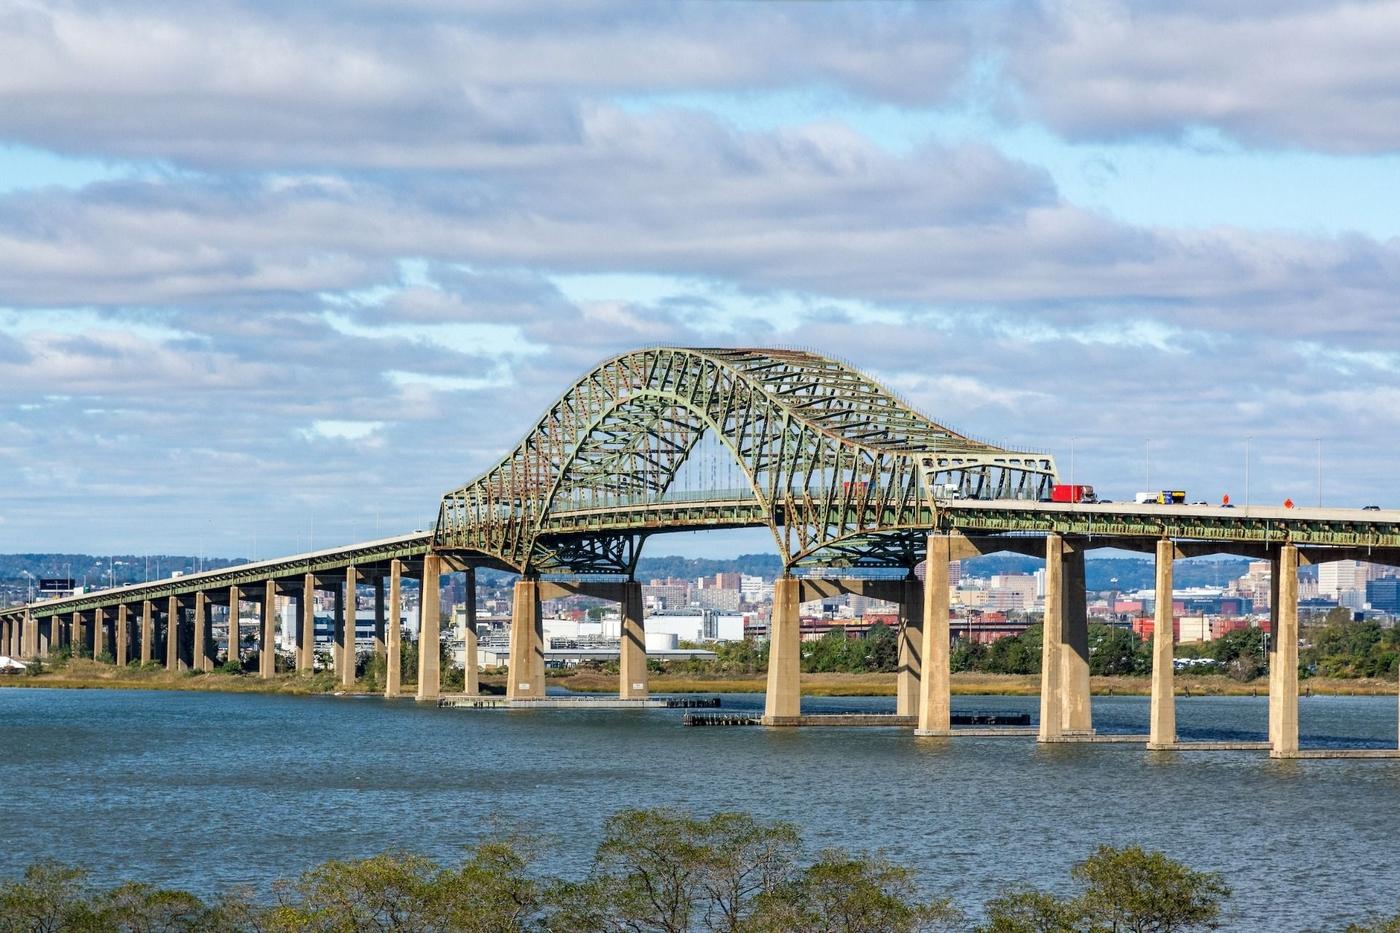 Outdoor image of city bridge over river